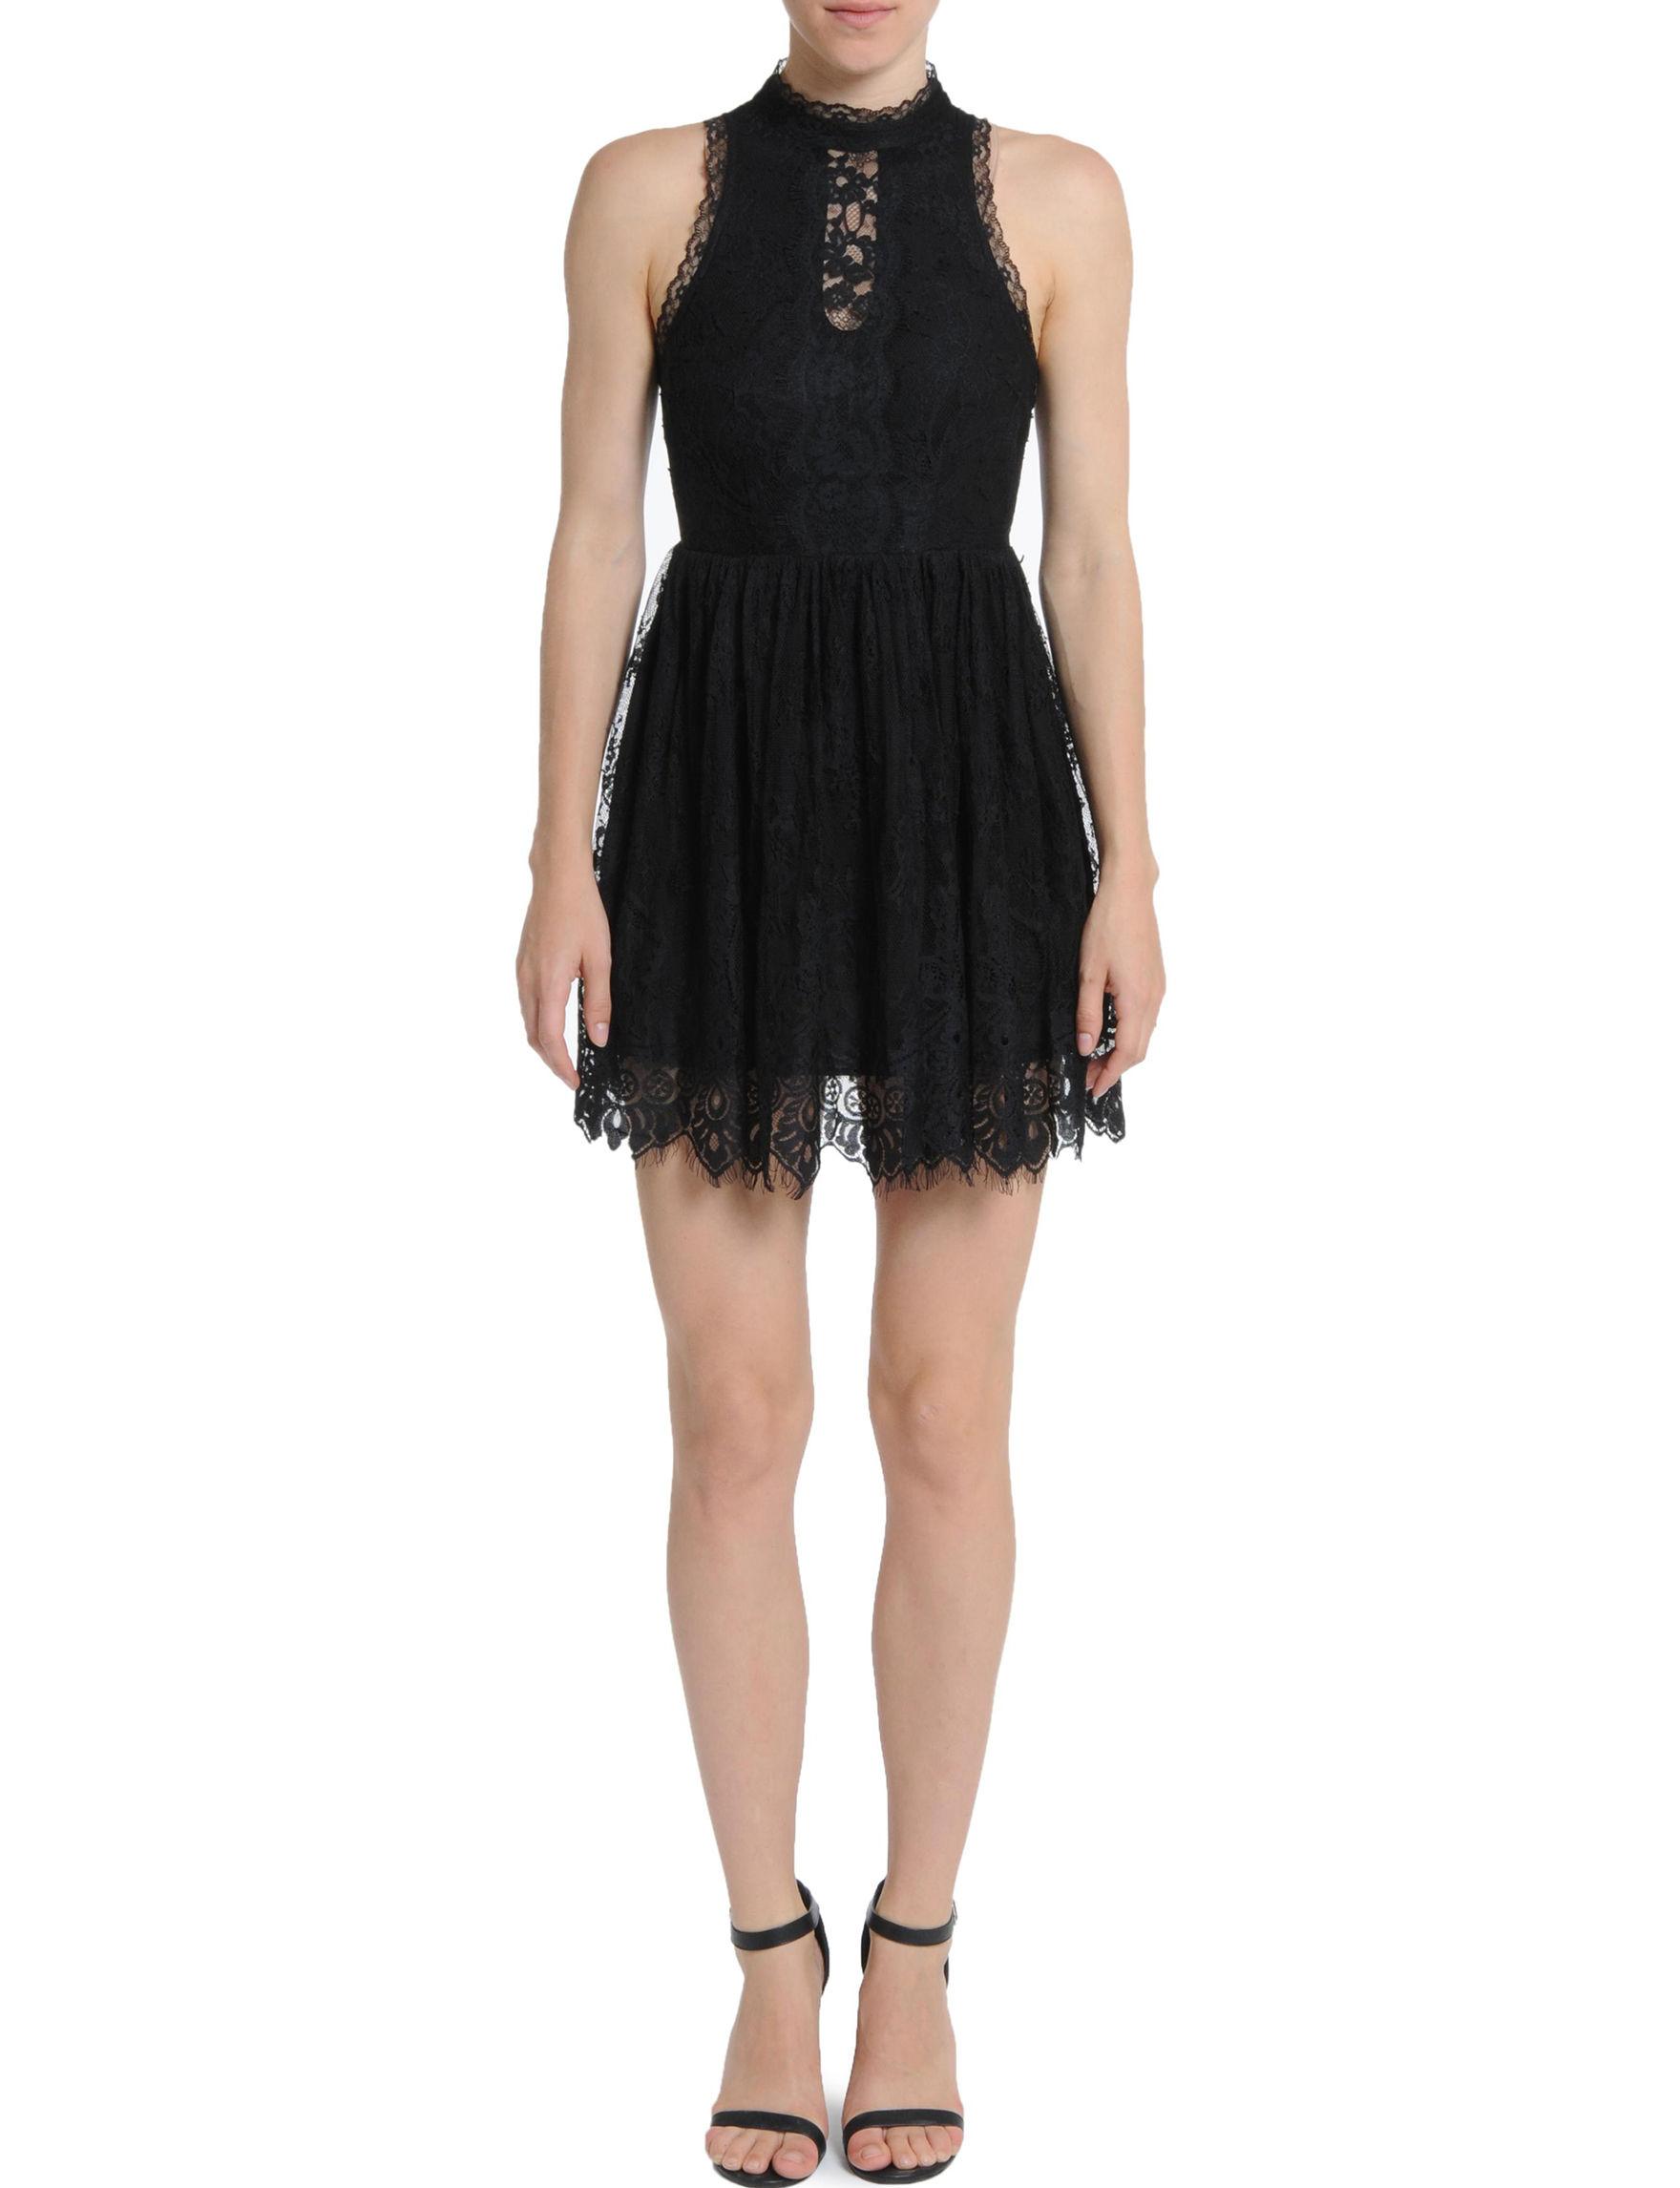 Romeo + Juliet Couture Black Fit & Flare Dresses